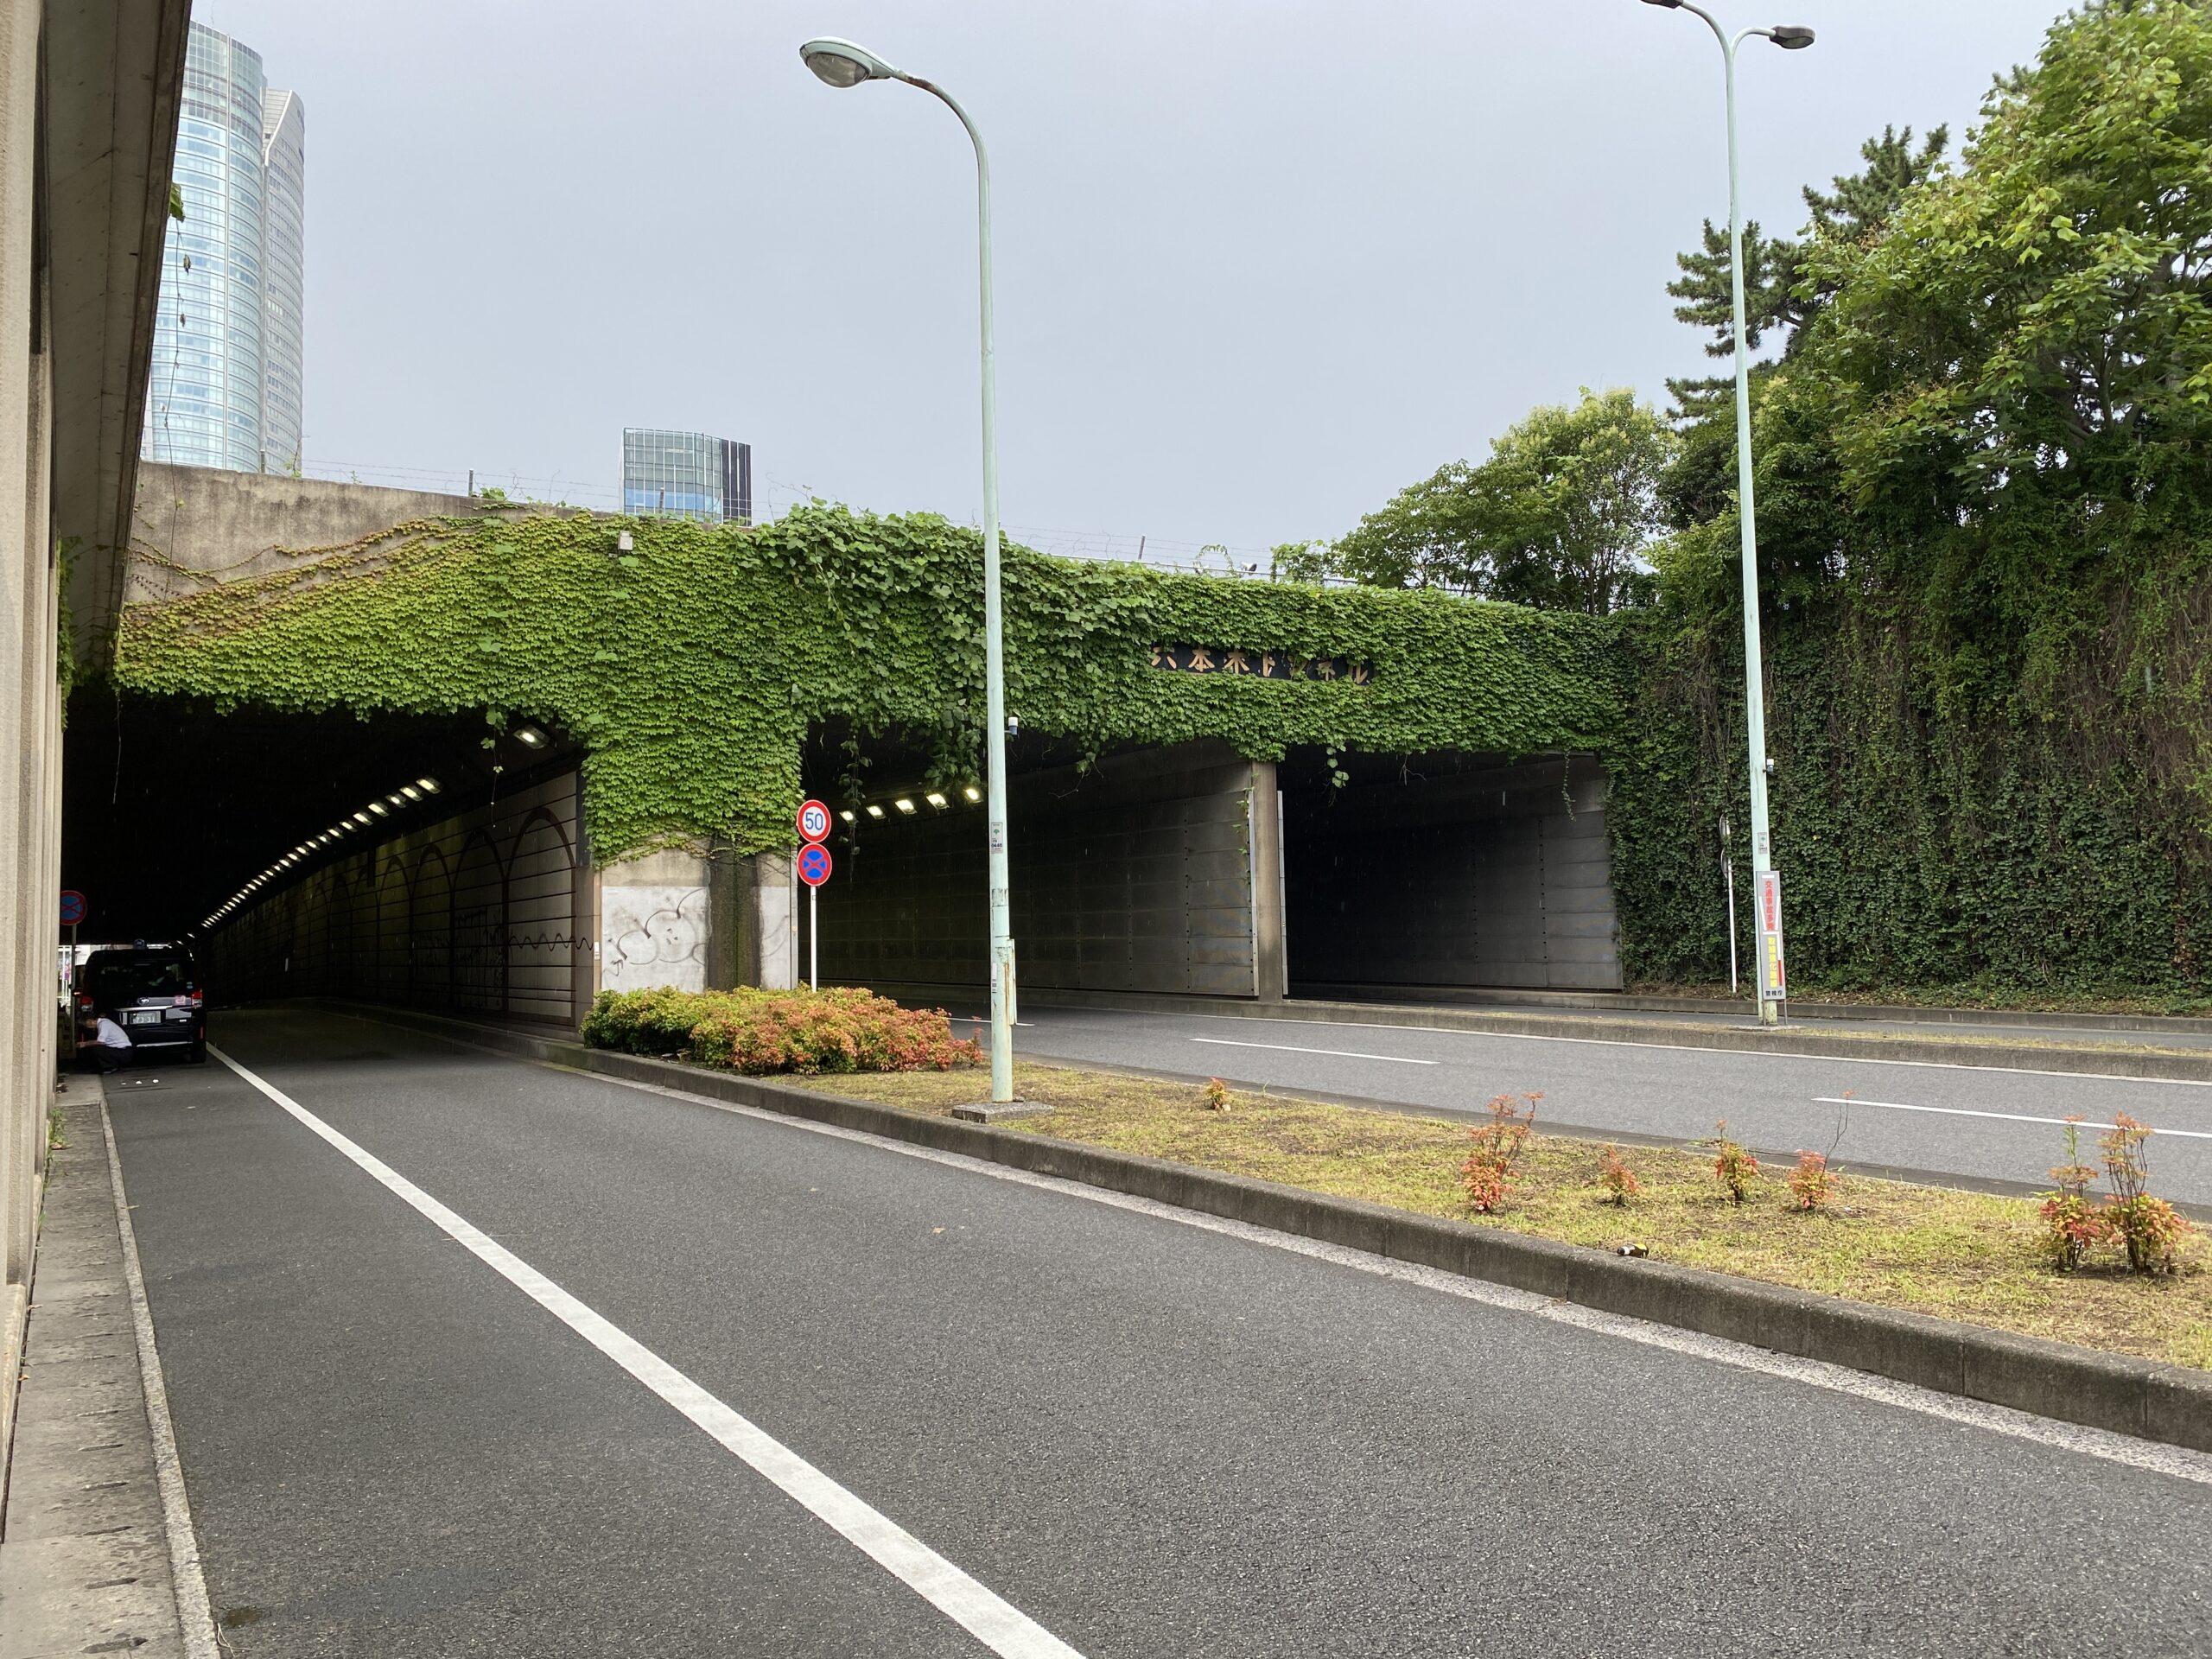 B'zが「Crazy Rendezvous」の排気音を録音した六本木トンネルの写真